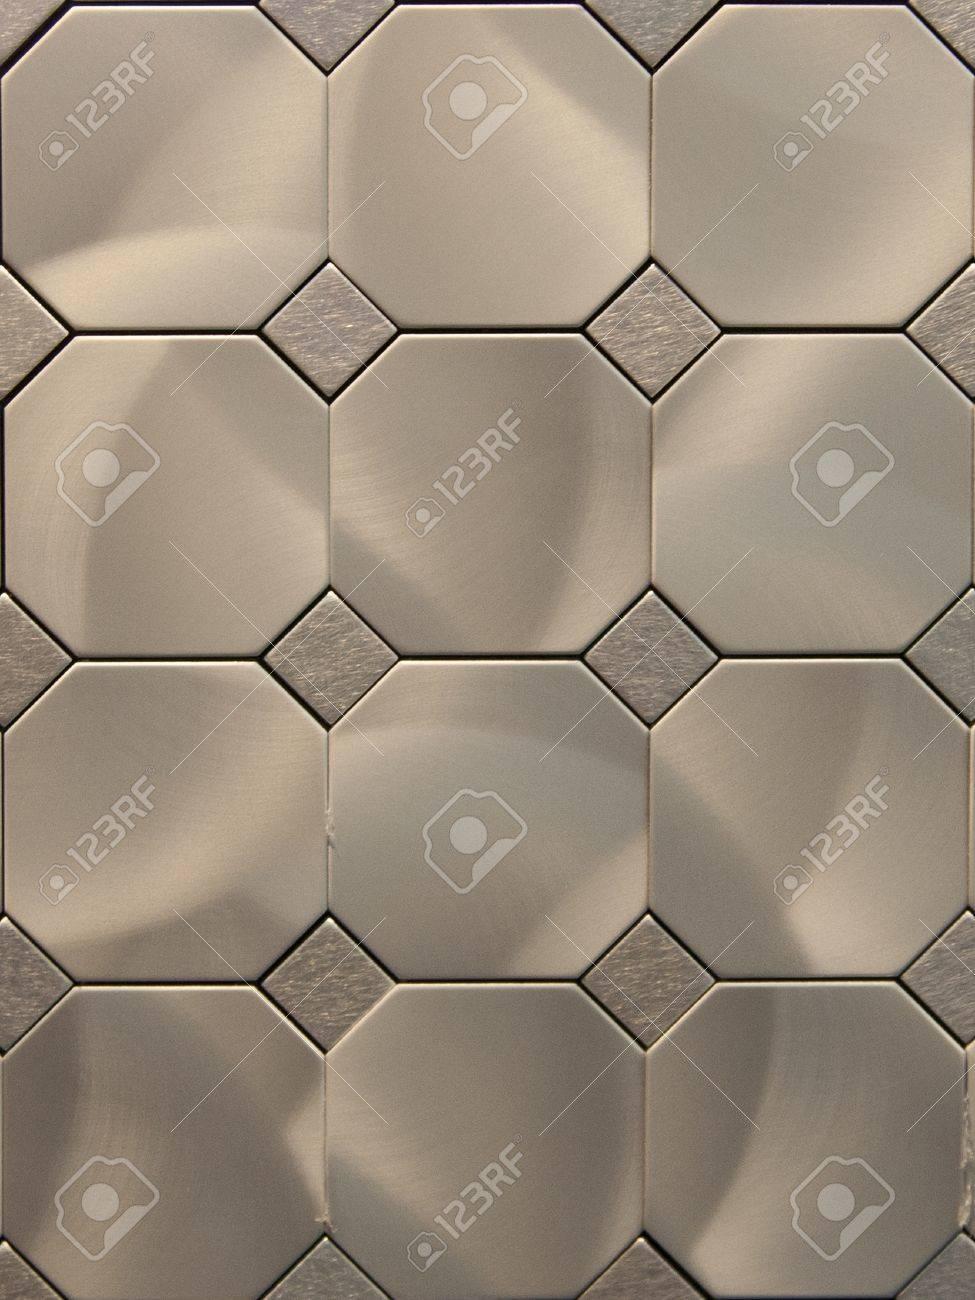 The actual texture of metal tiles